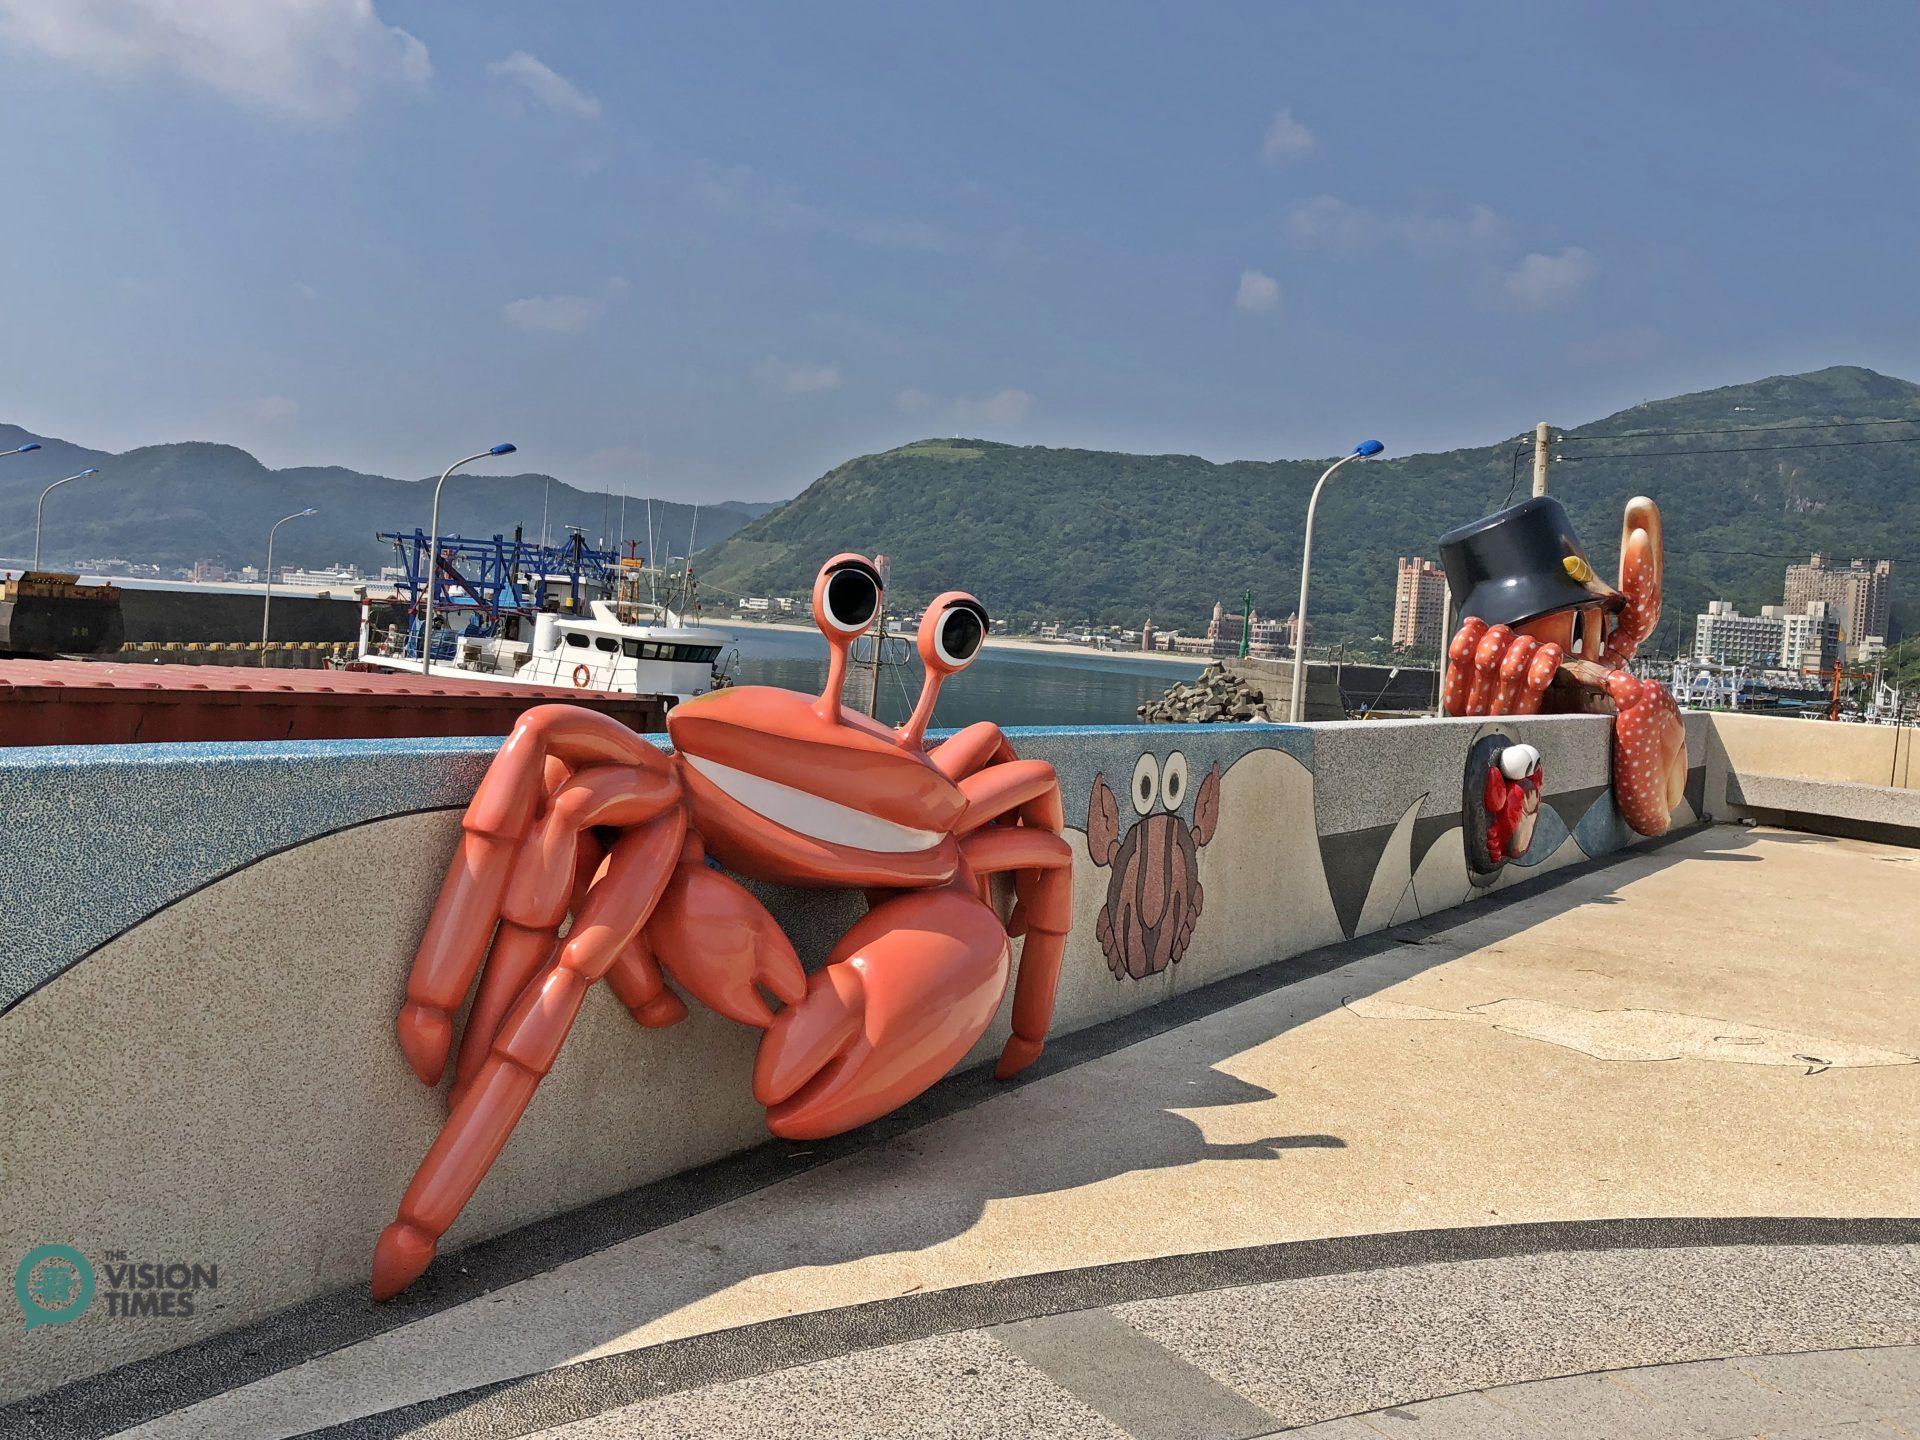 The Crab Theme Park at the Guihou Fishing Harbor. (Image: Julia Fu / Vision Times)